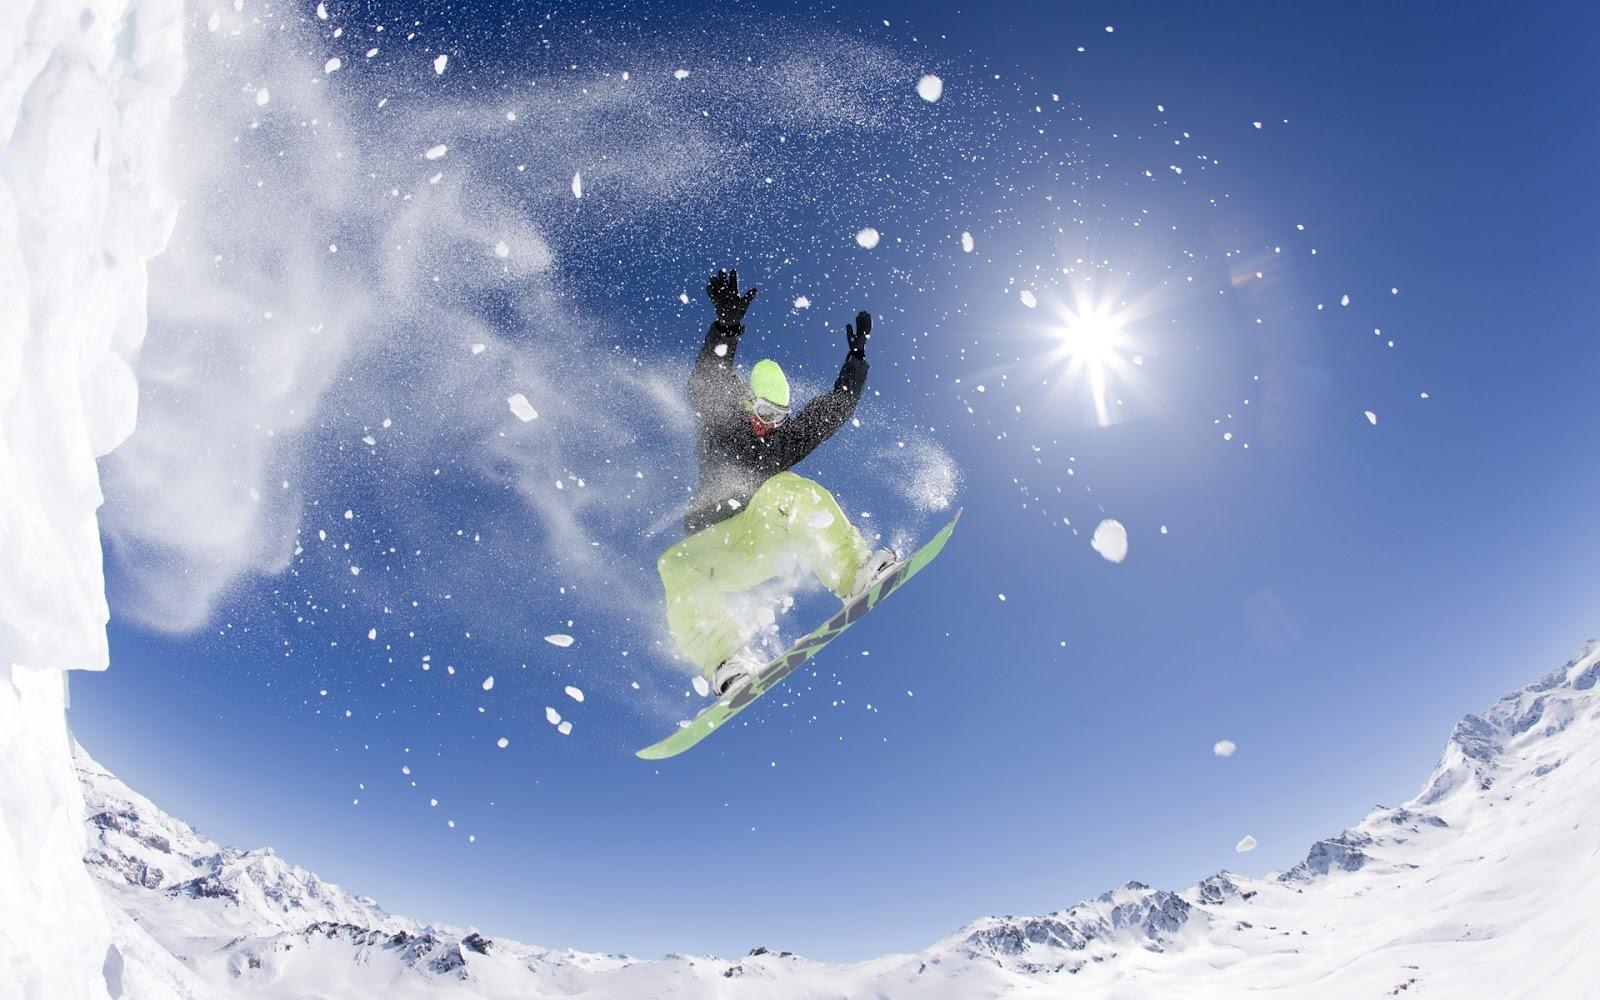 http://2.bp.blogspot.com/-rPj-Ui1Td1E/UG81Tv4juaI/AAAAAAAAHoY/XSu8nWDrxwc/s1600/snowboarding-2.jpg